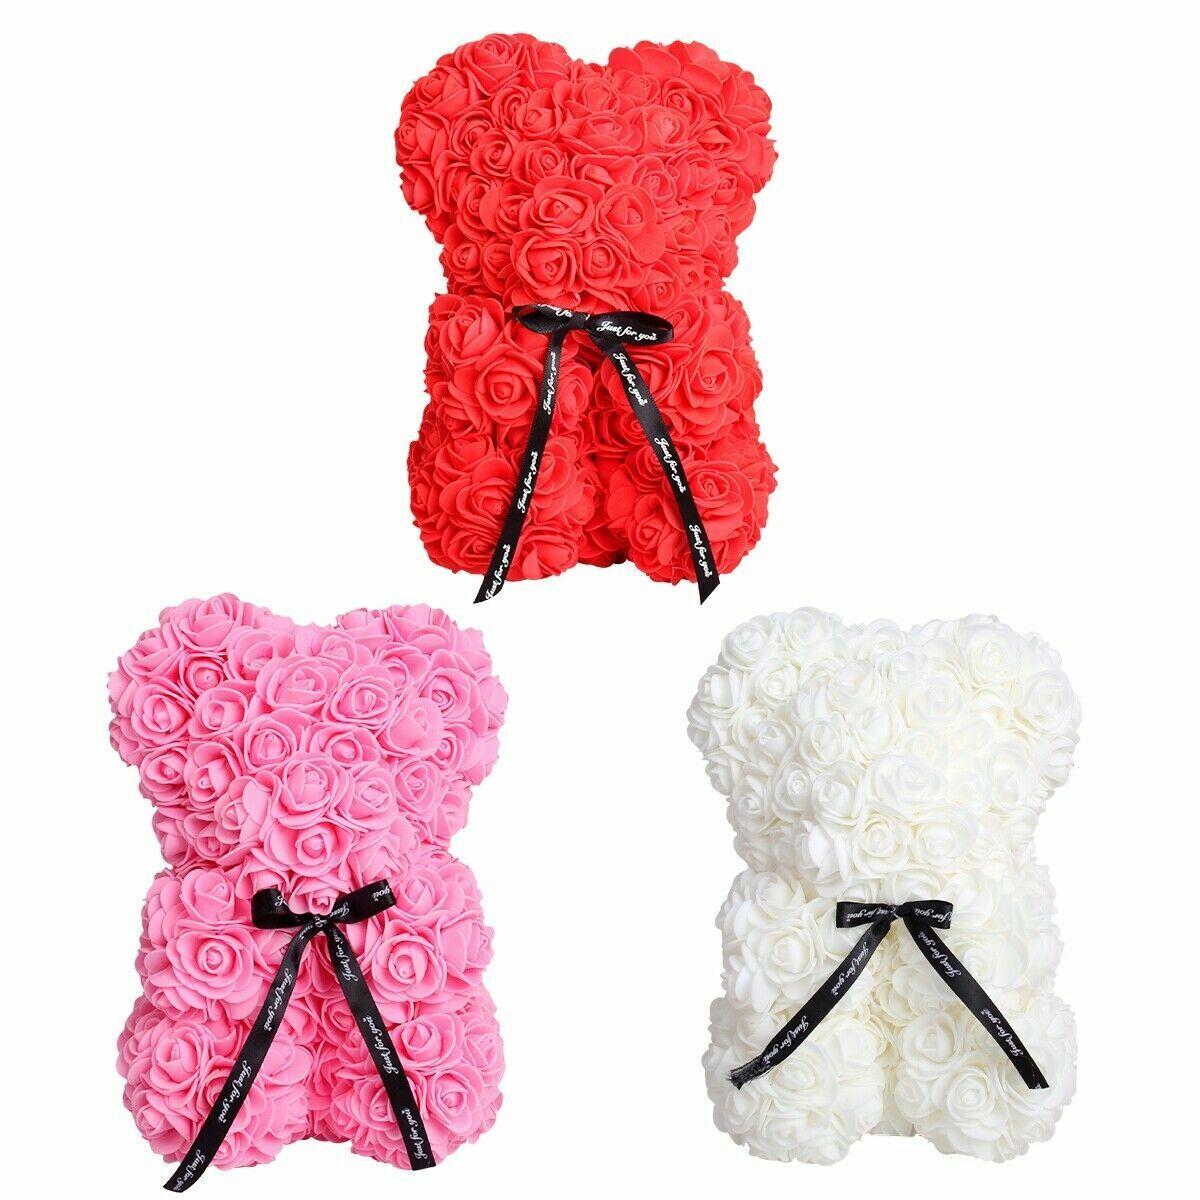 25cm Rose Flower Bear Teddy Birthday Valentine Wedding Party Kid Birthday Gift Holiday & Seasonal Décor